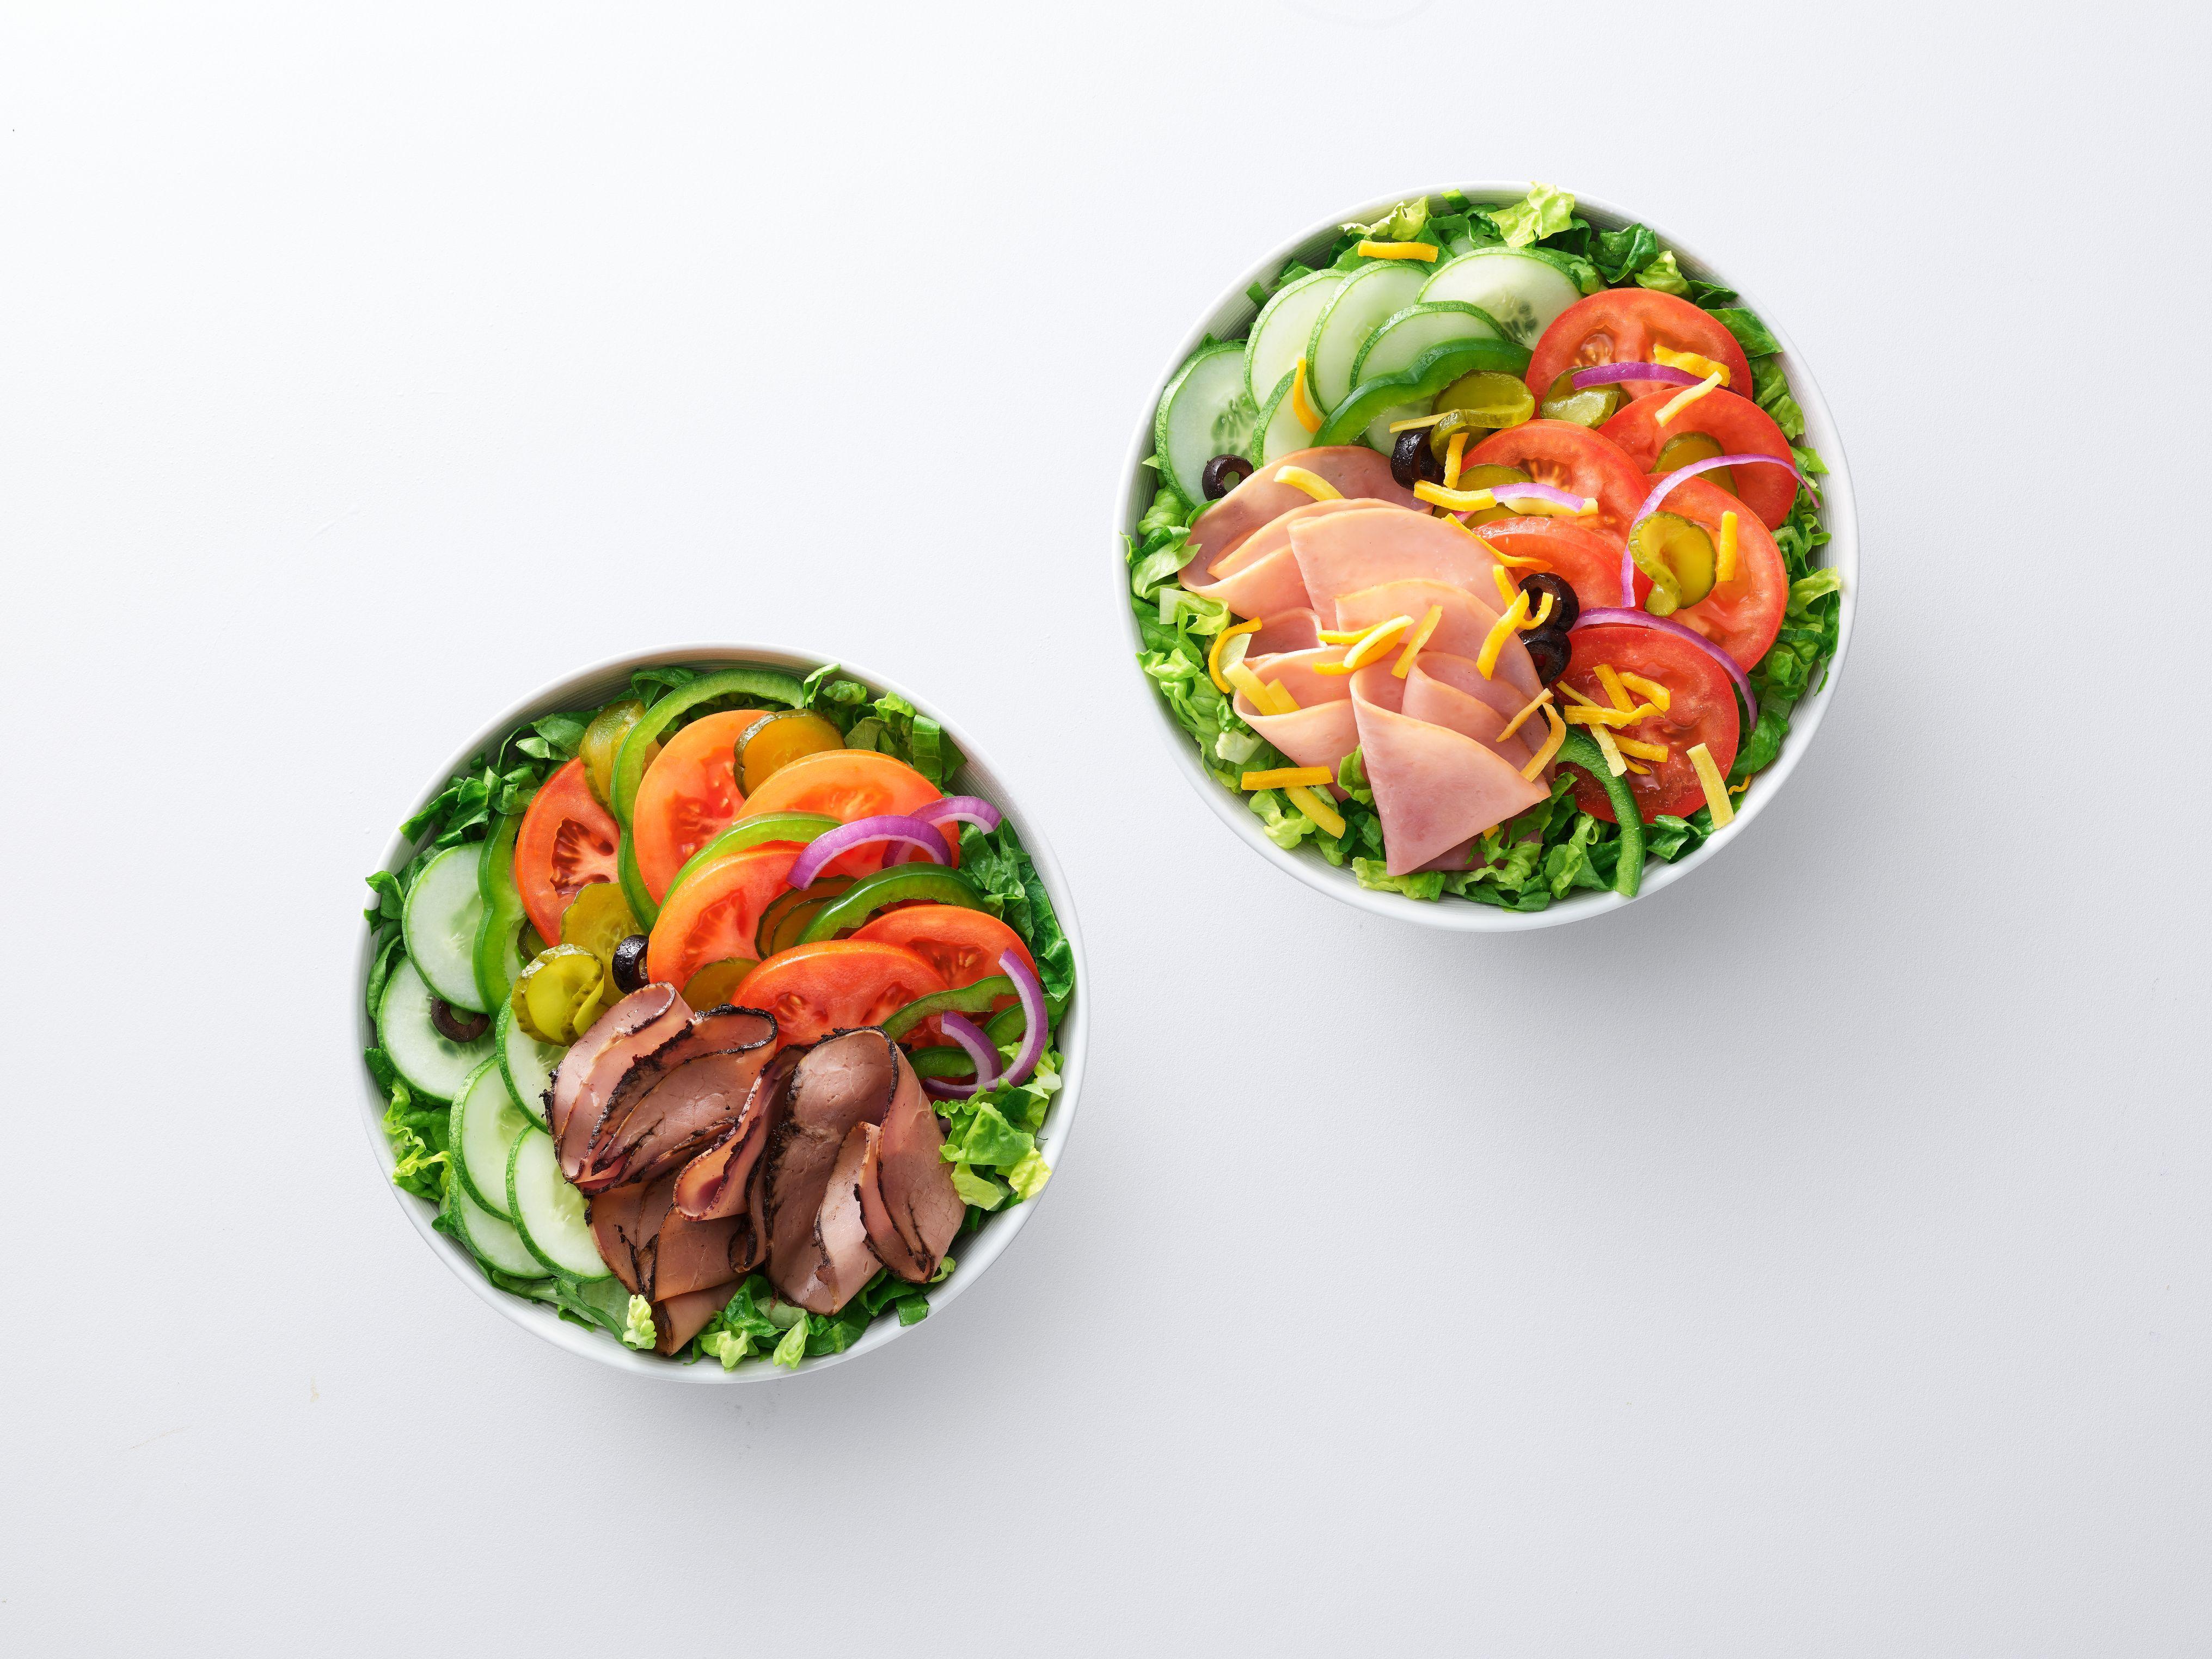 Subway (Eastpoint Mall) - Dine, Shop, Earn